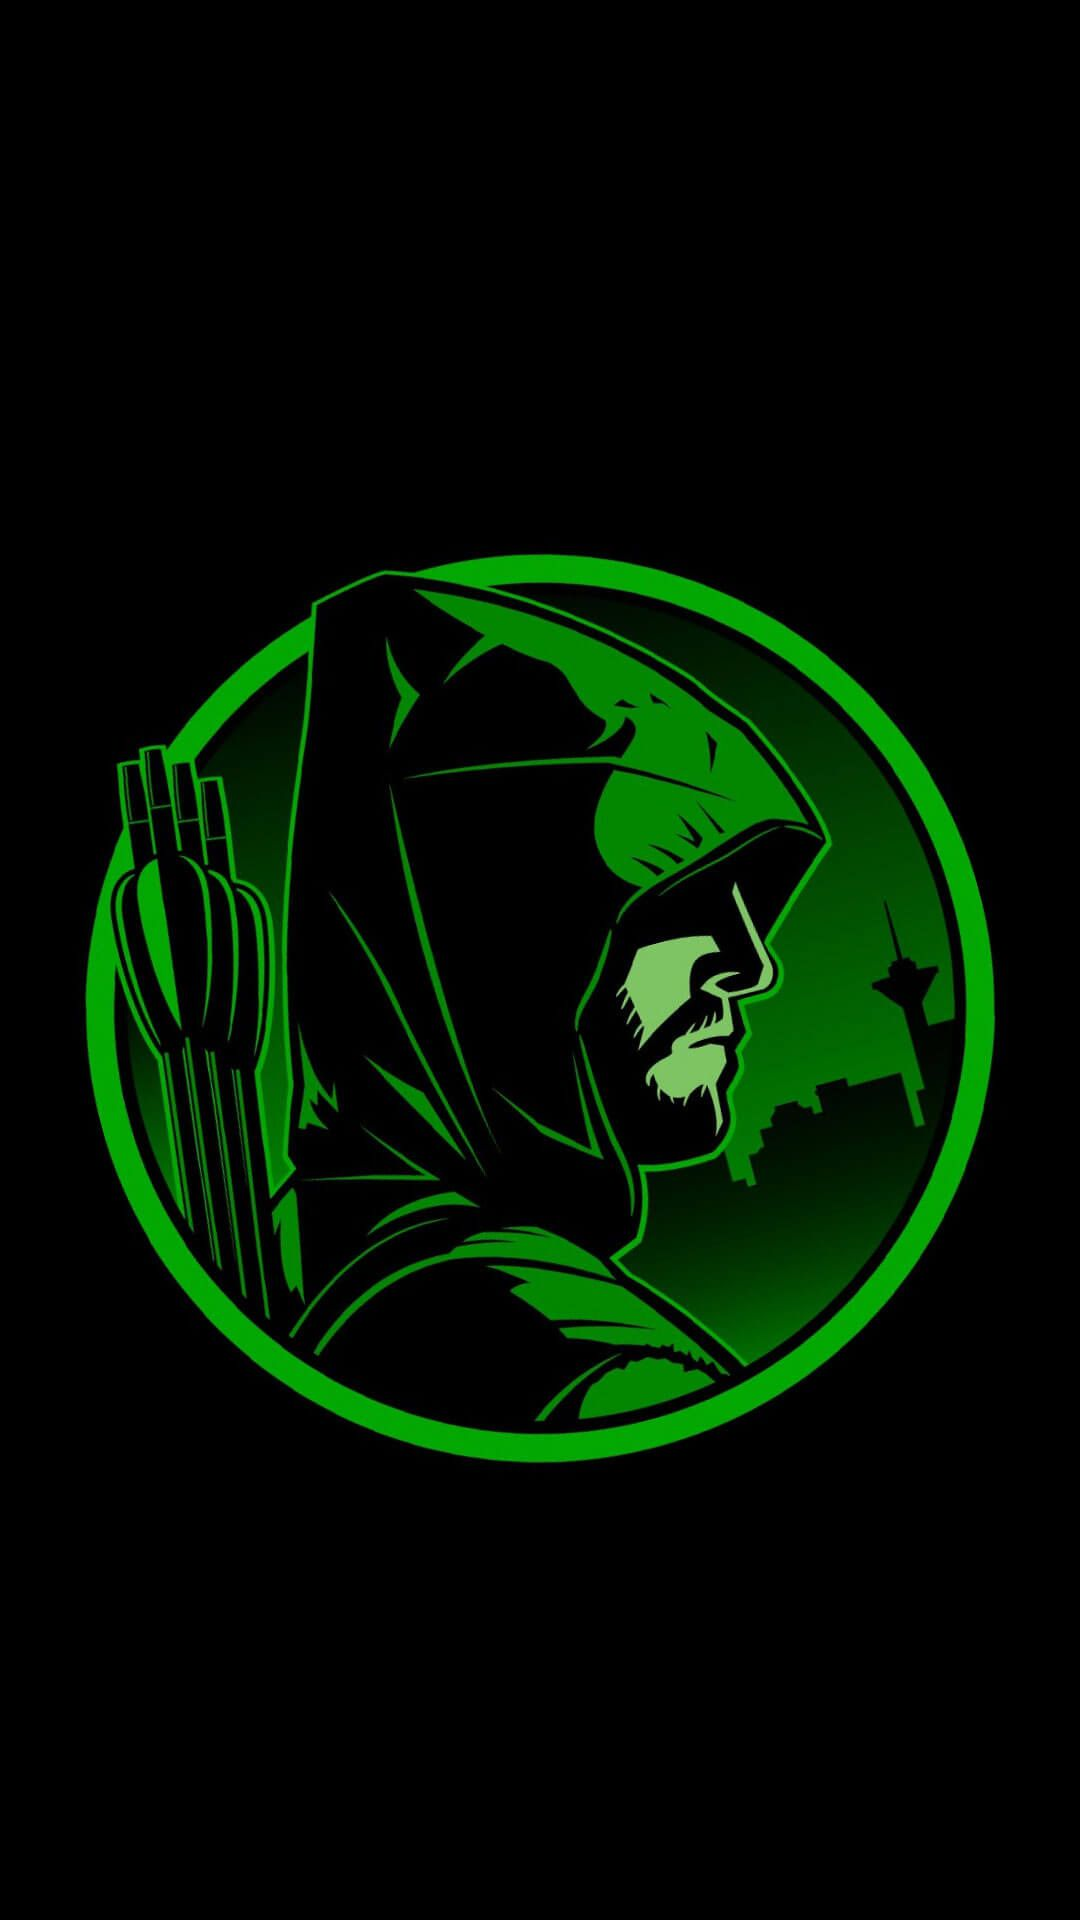 Green Arrow Iphone Wallpapers Top Free Green Arrow Iphone